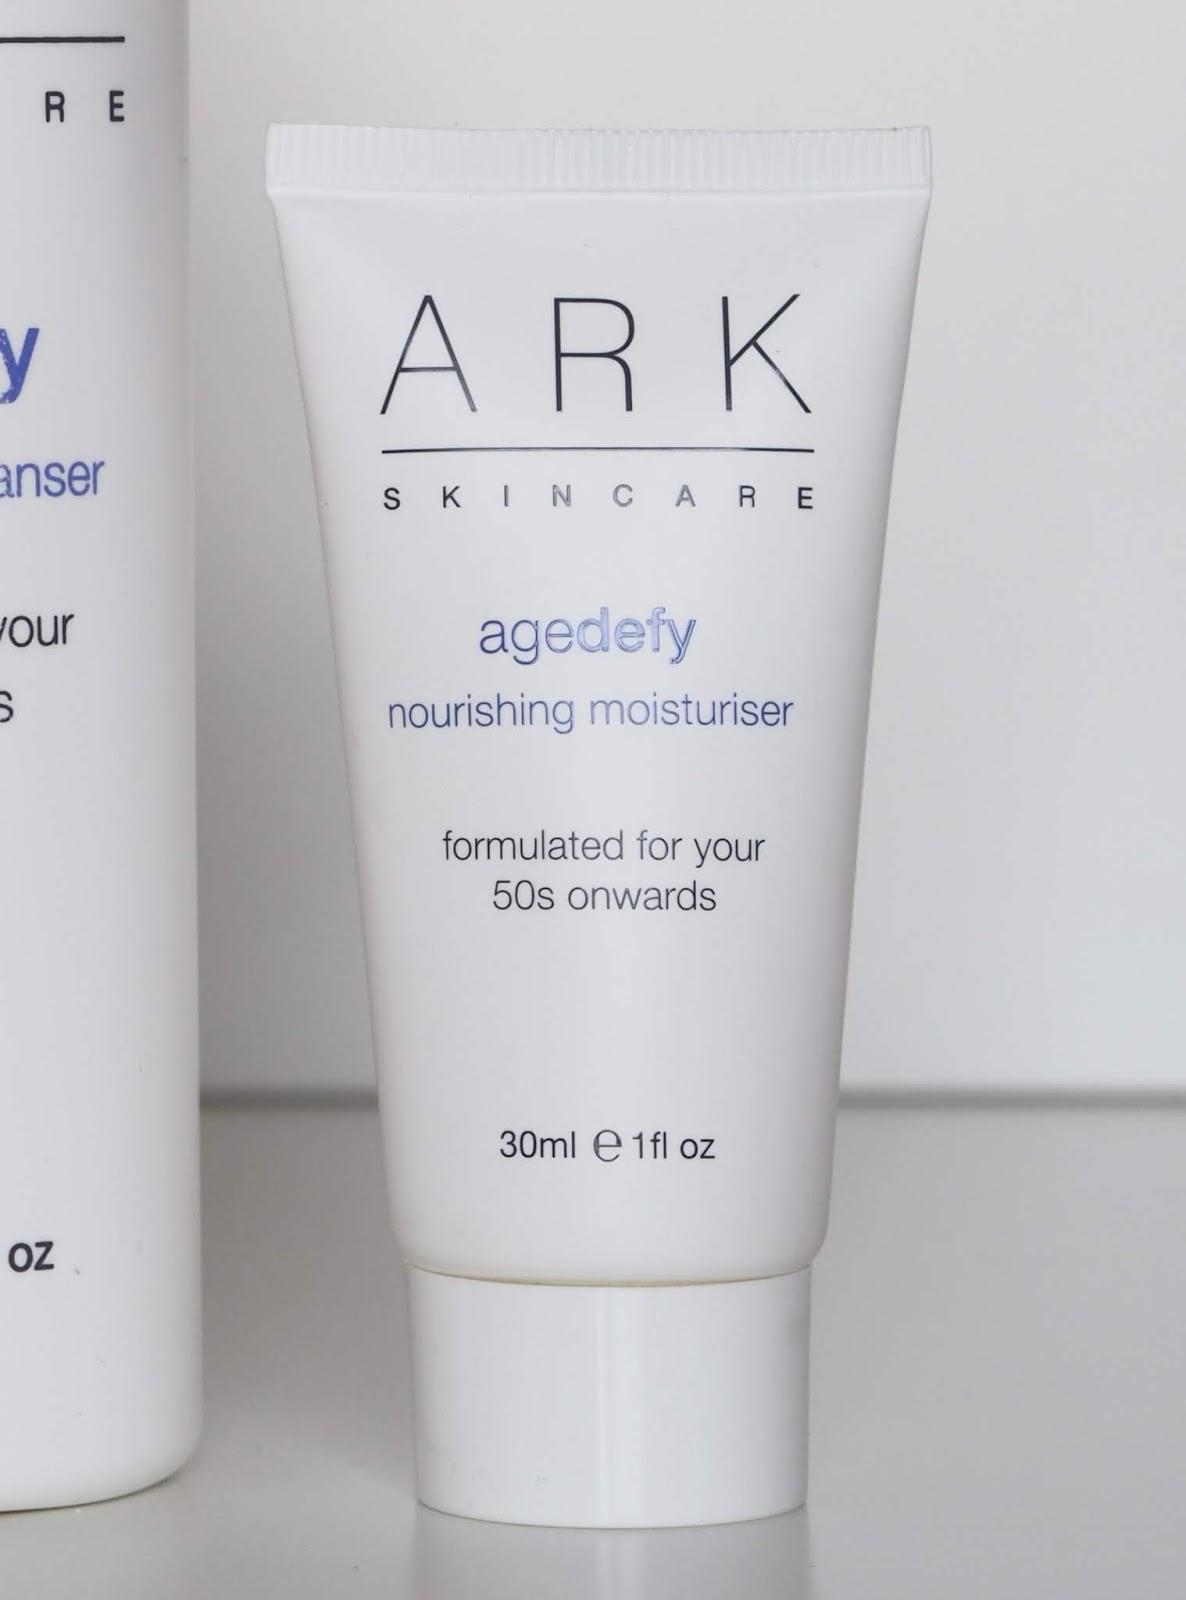 ARK age defy moisturiser